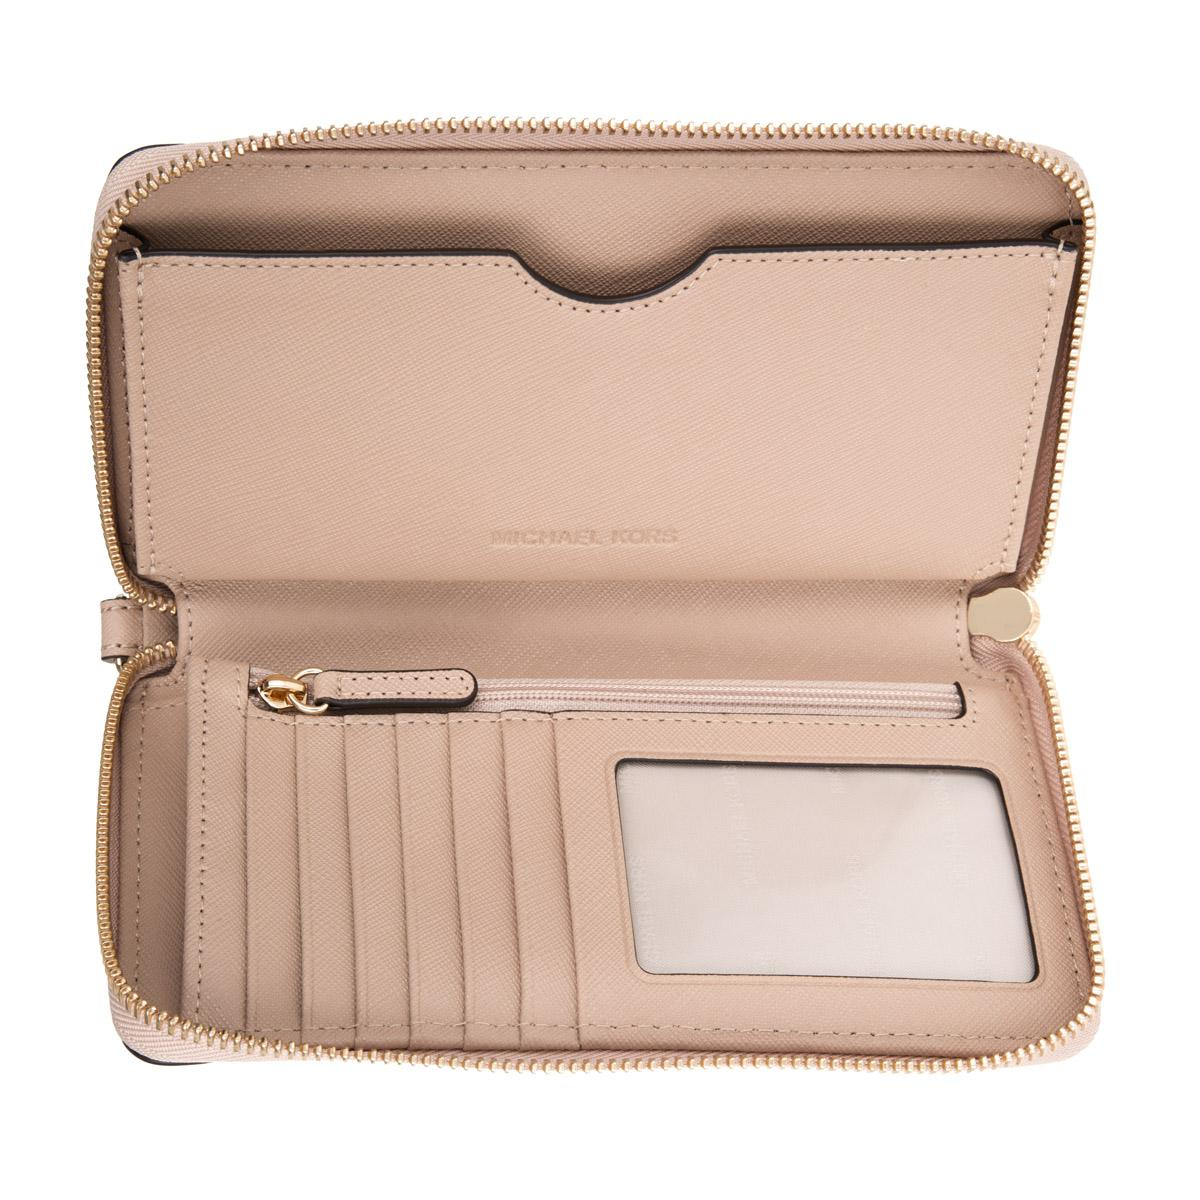 8e1e5a105f83 Michael Kors Mercer Lg Flat Multifunction Phone Case Leather Oyster ...